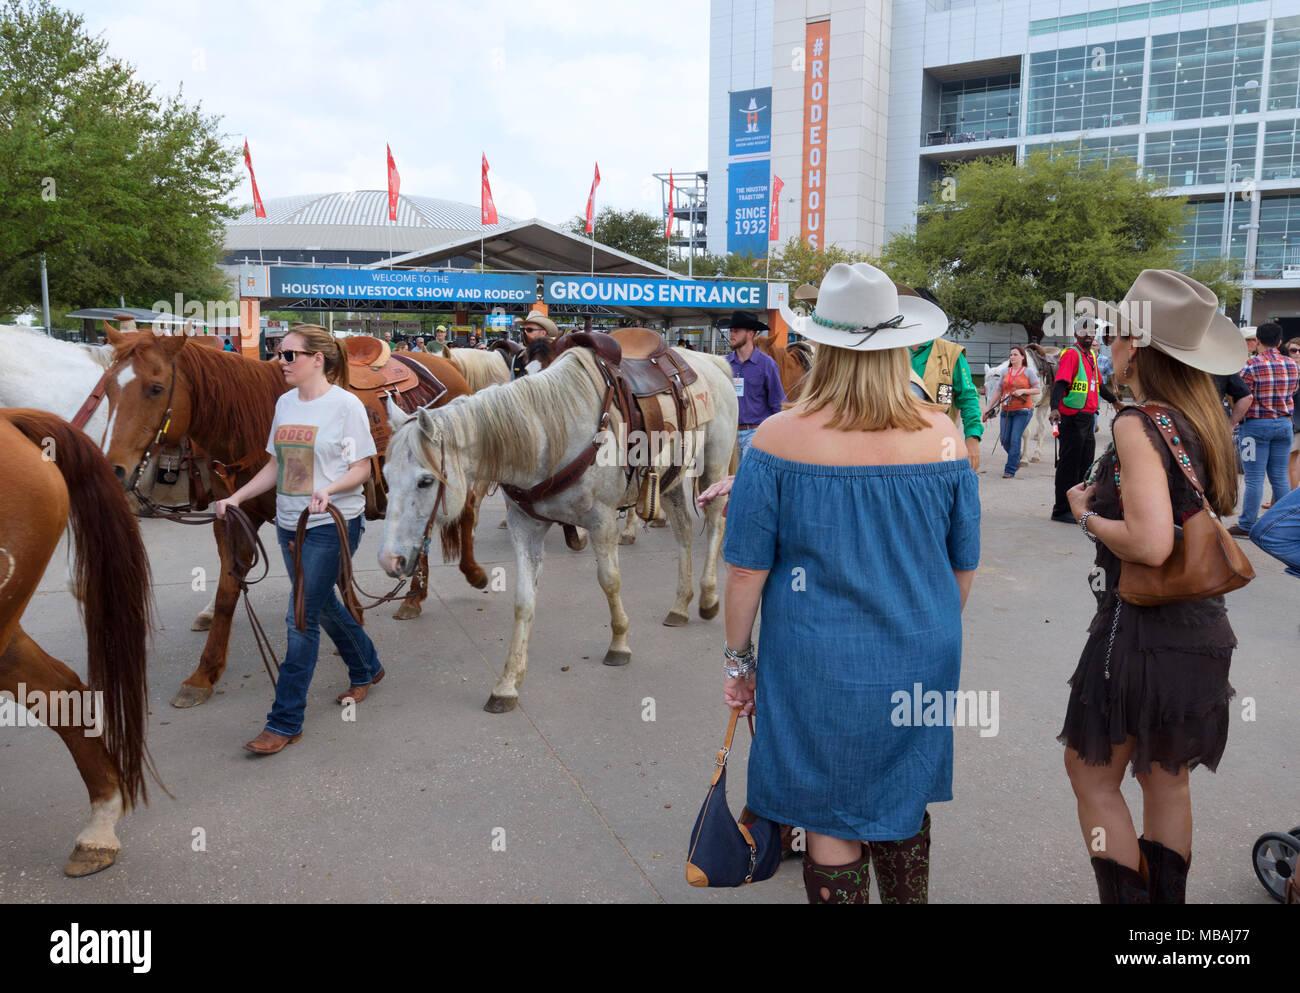 Two Texas women watching horses, Houston Livestock Show and Rodeo, Houston, Texas USA - Stock Image